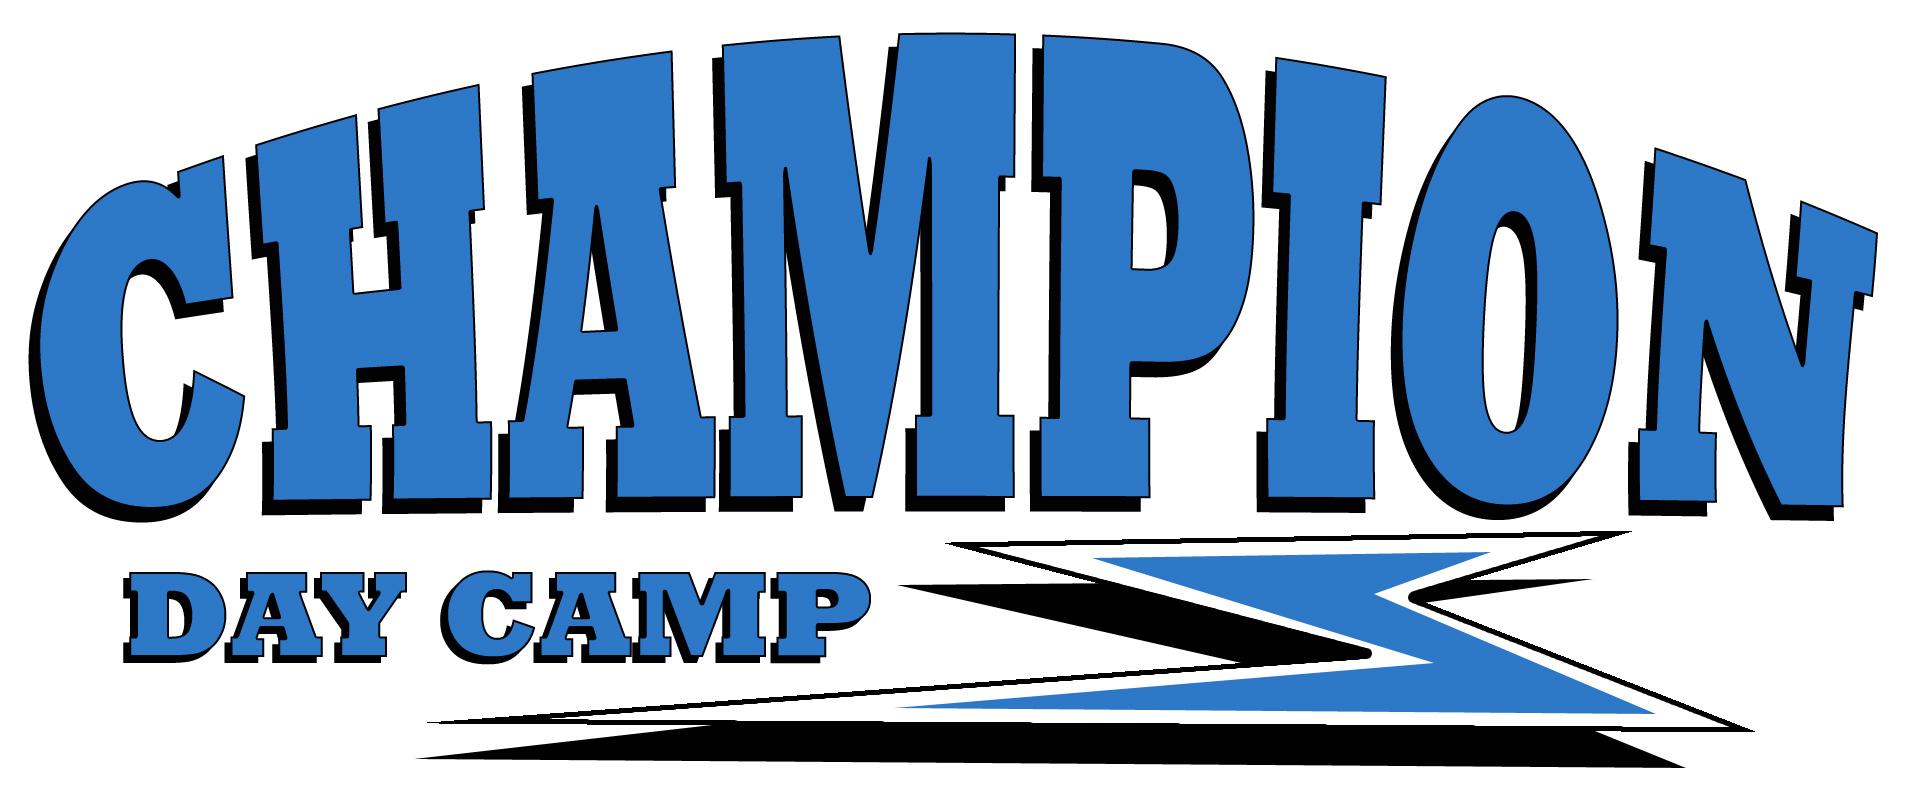 Champion Day Camp